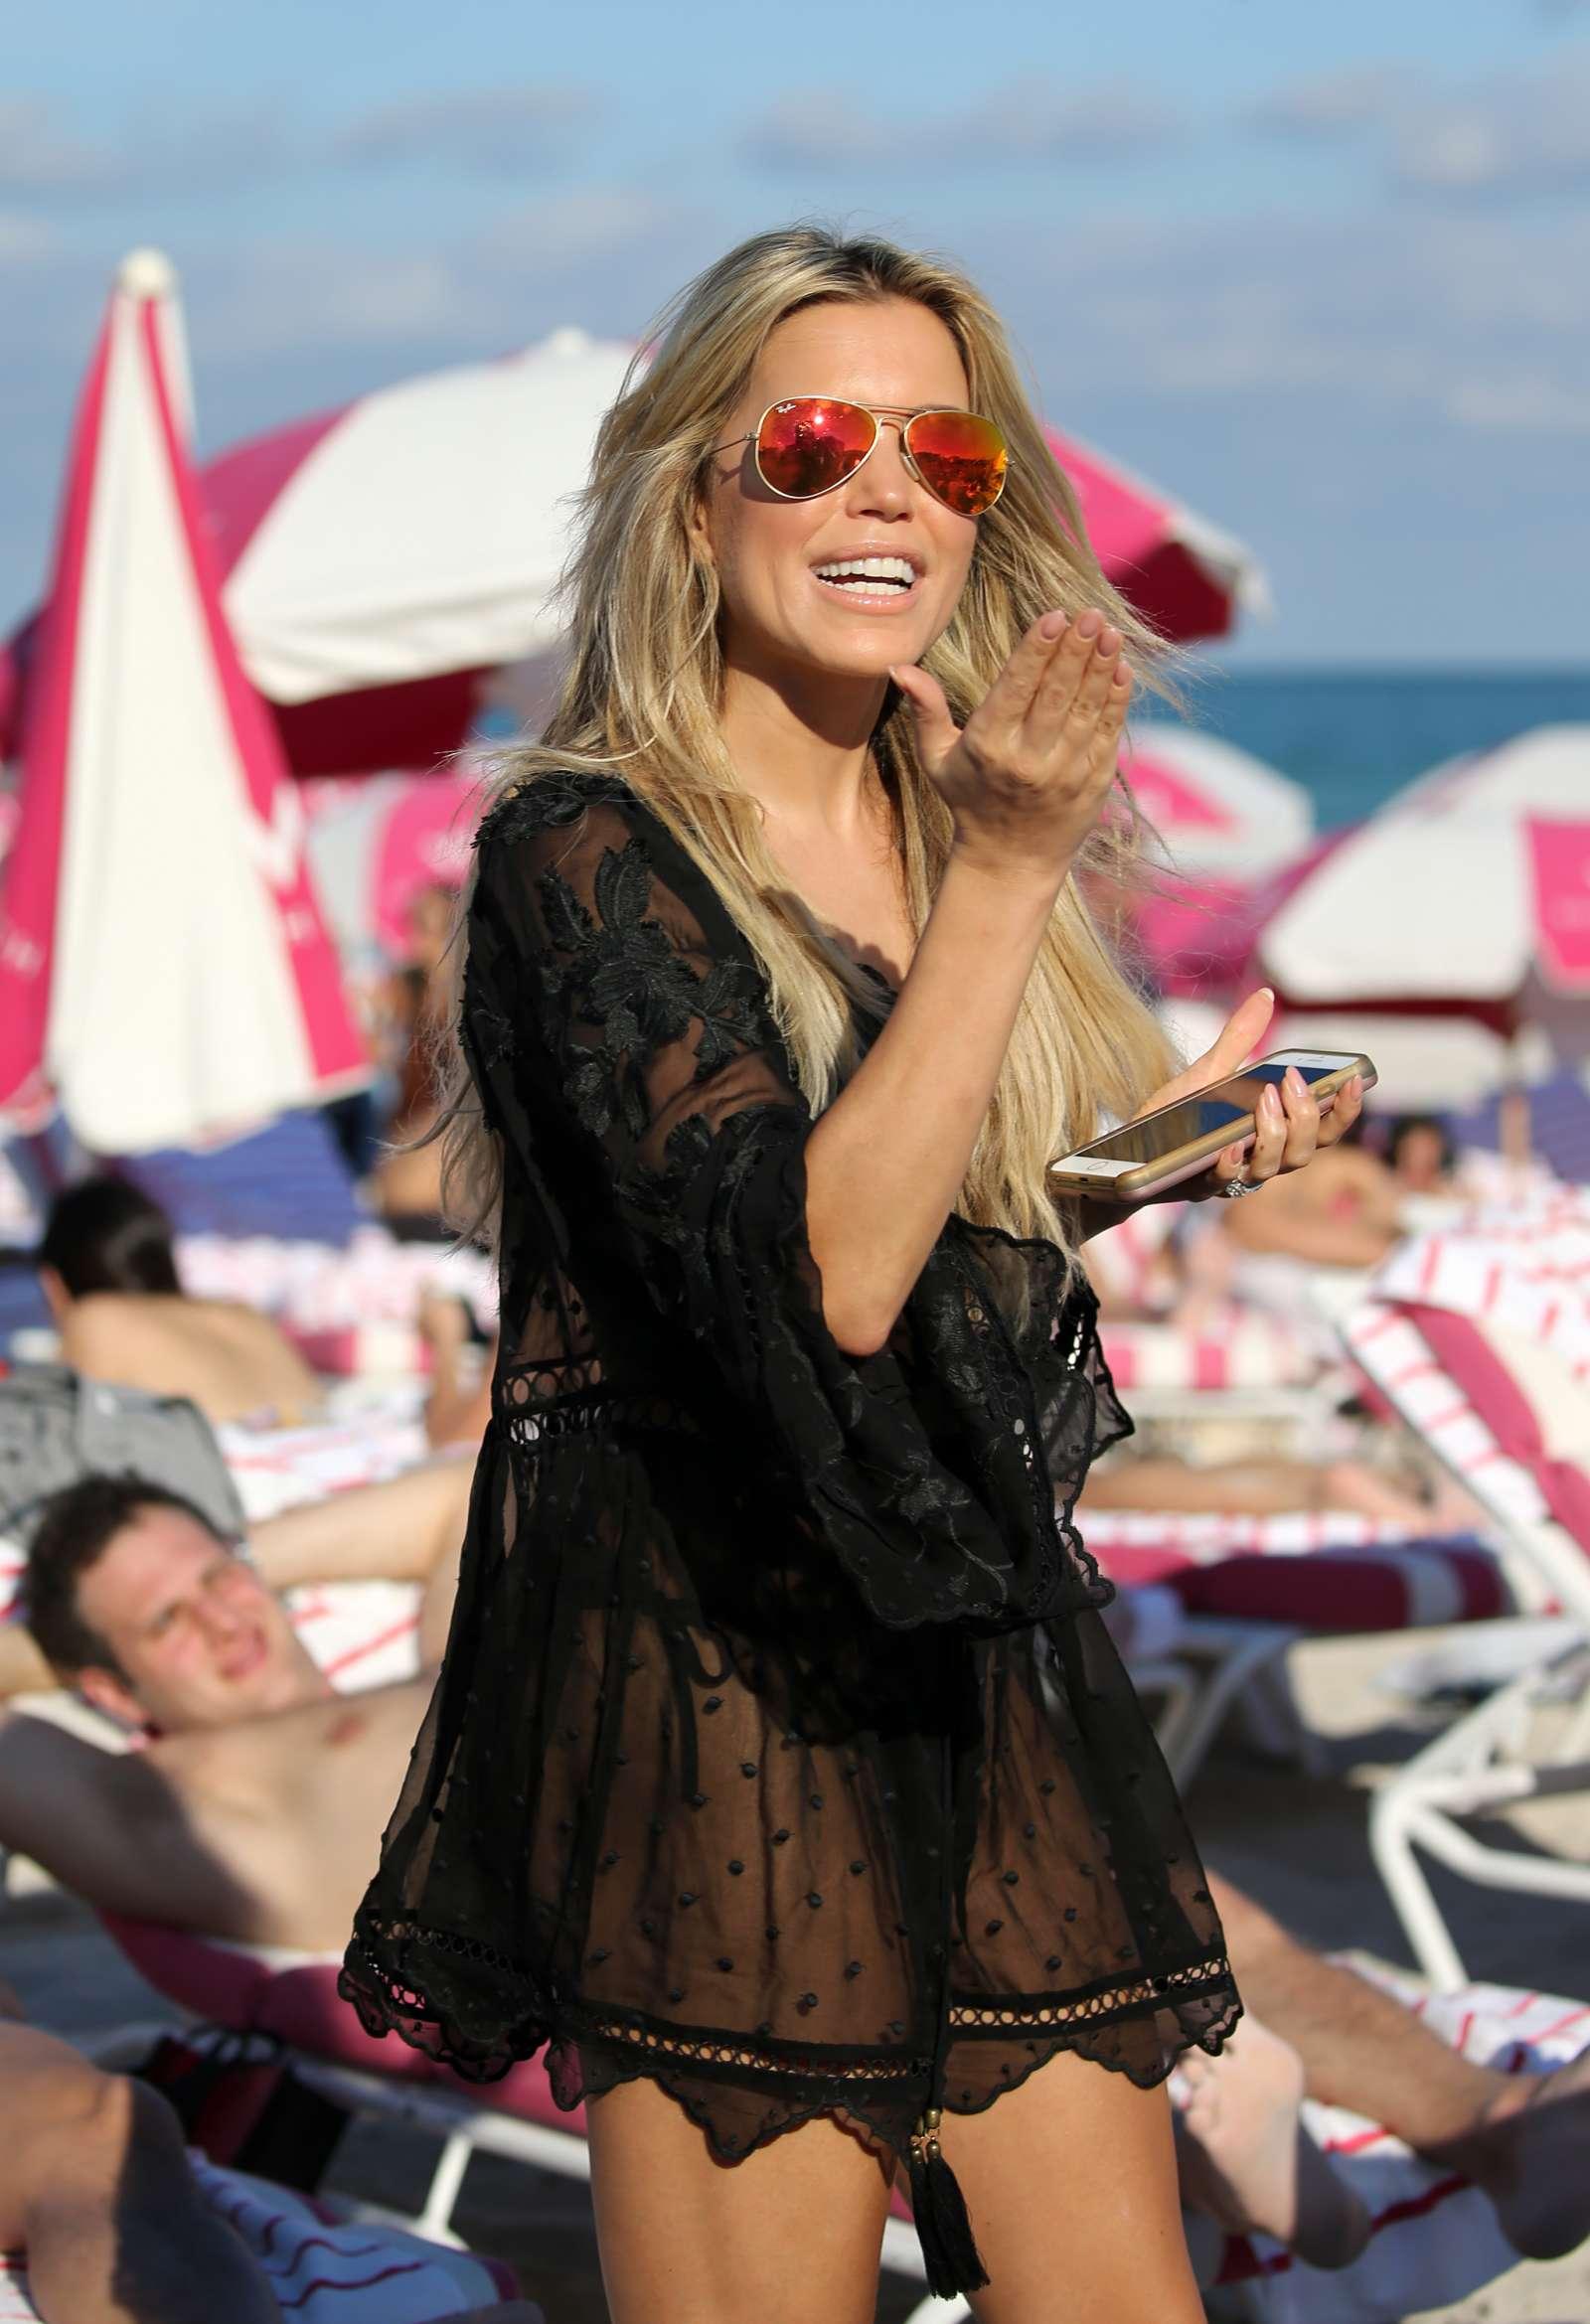 Sylvie Meis 2017 : Sylvie Meis in Black Bikini 2017 -09